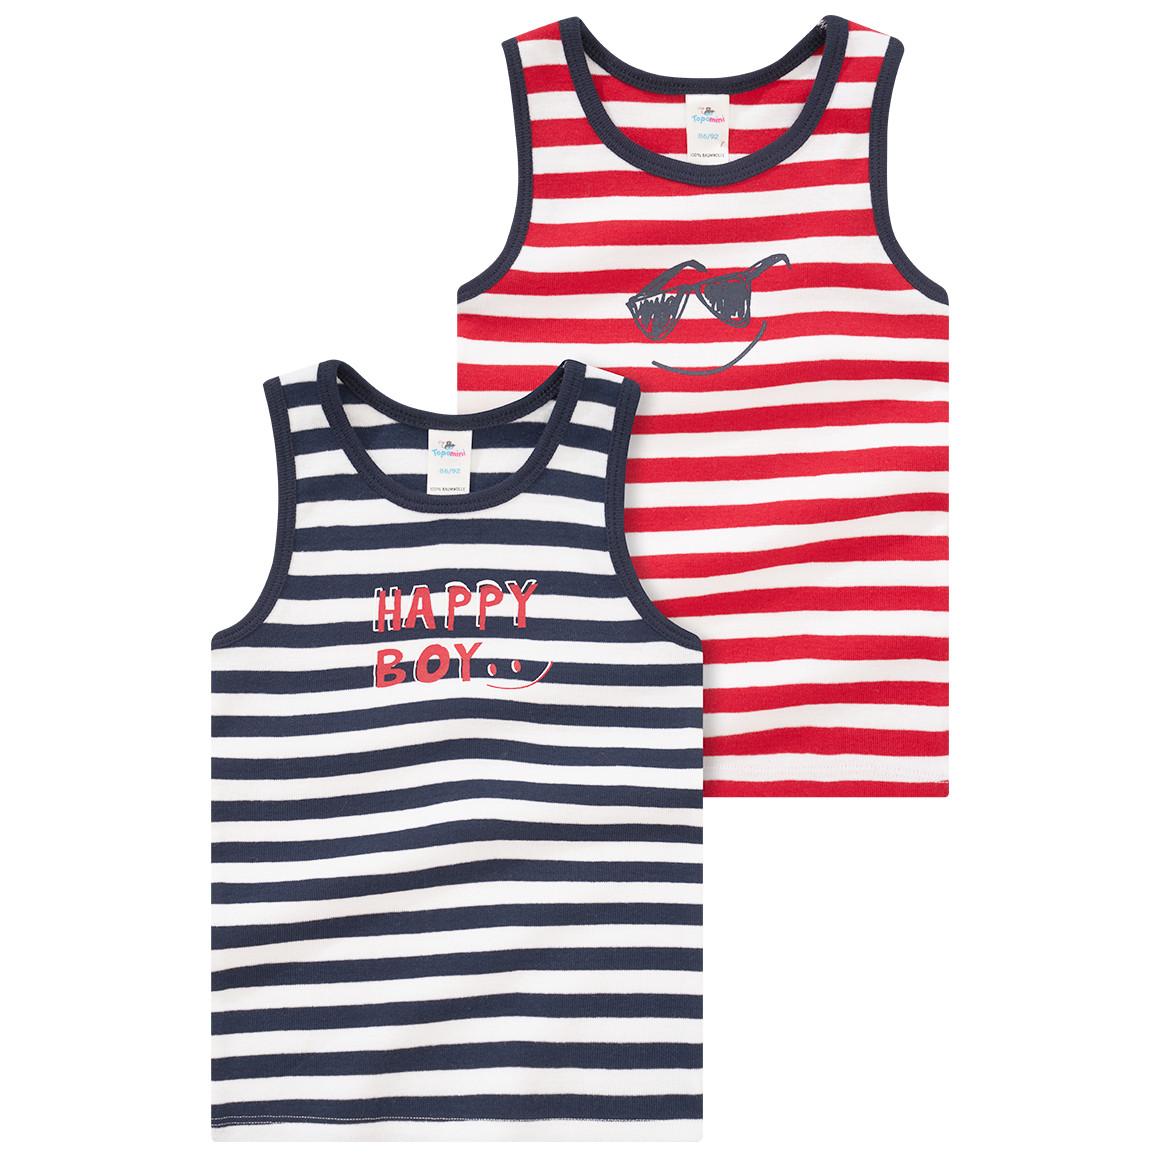 2 Baby Unterhemden im Ringel Look